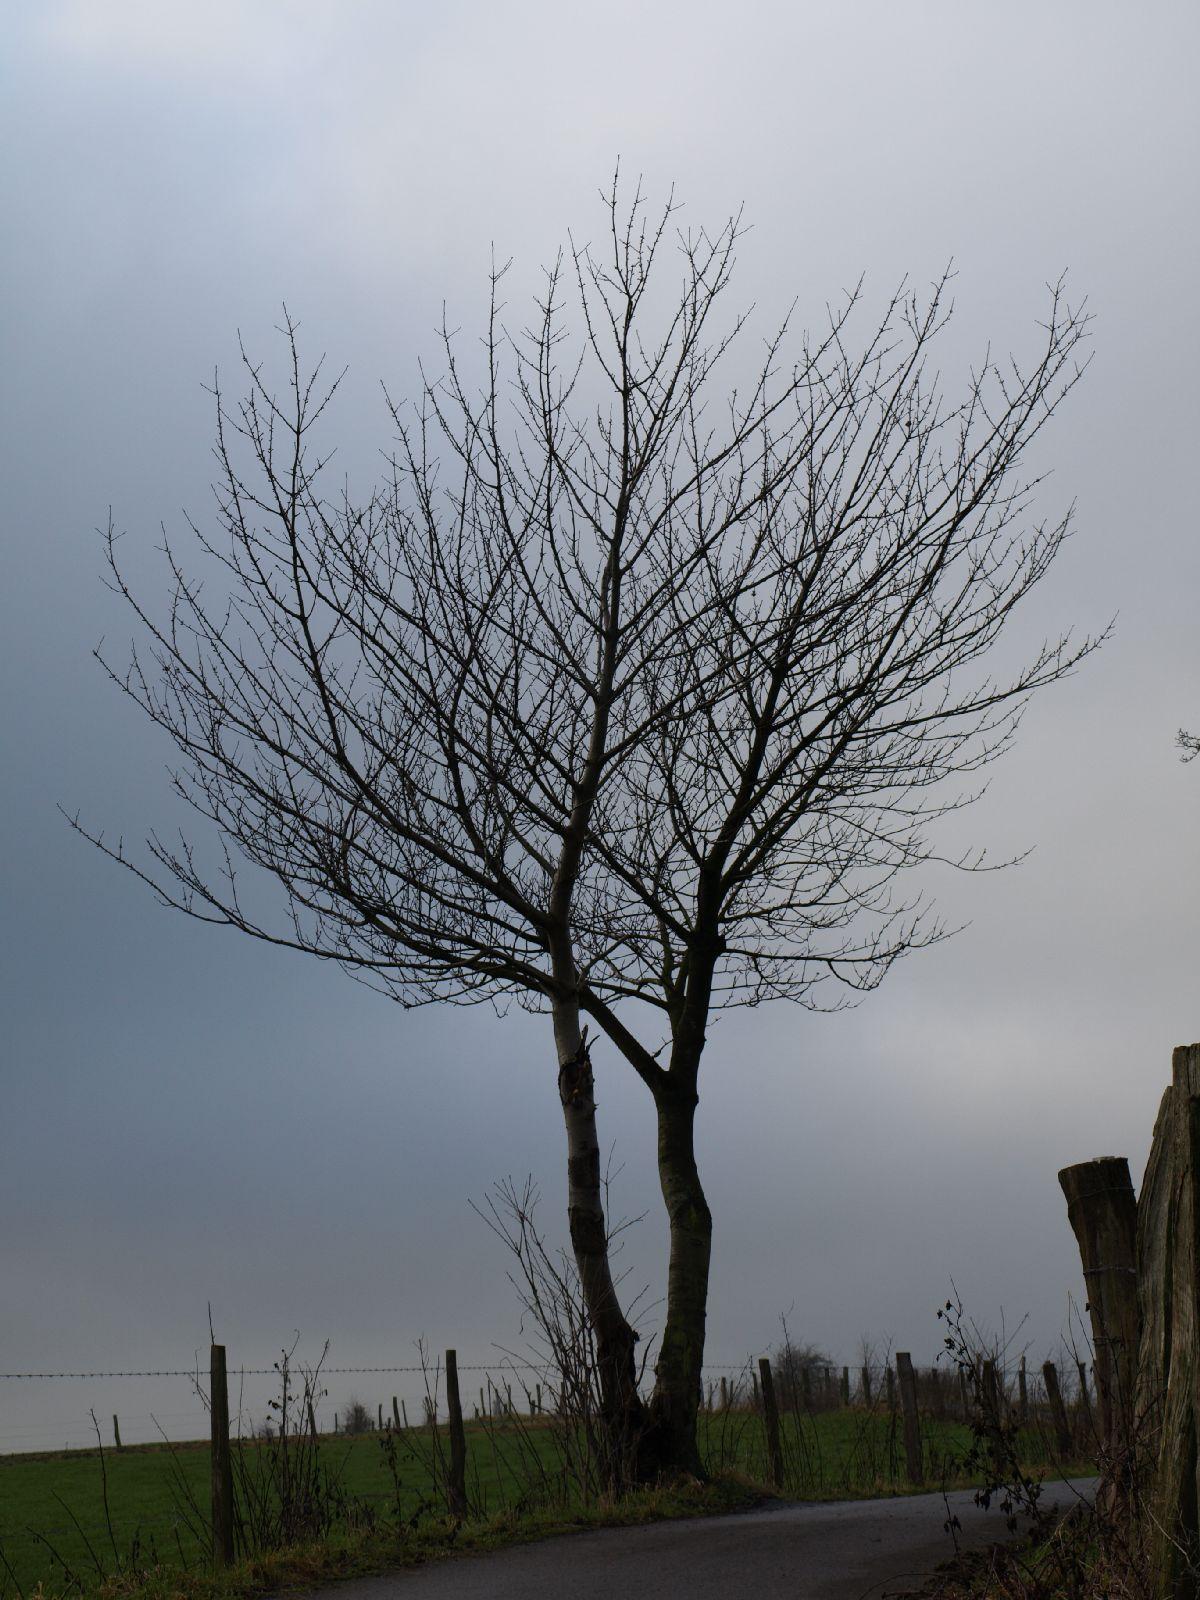 Pflanzen-Baum-Silhouette-Foto_Textur_B_PC238025